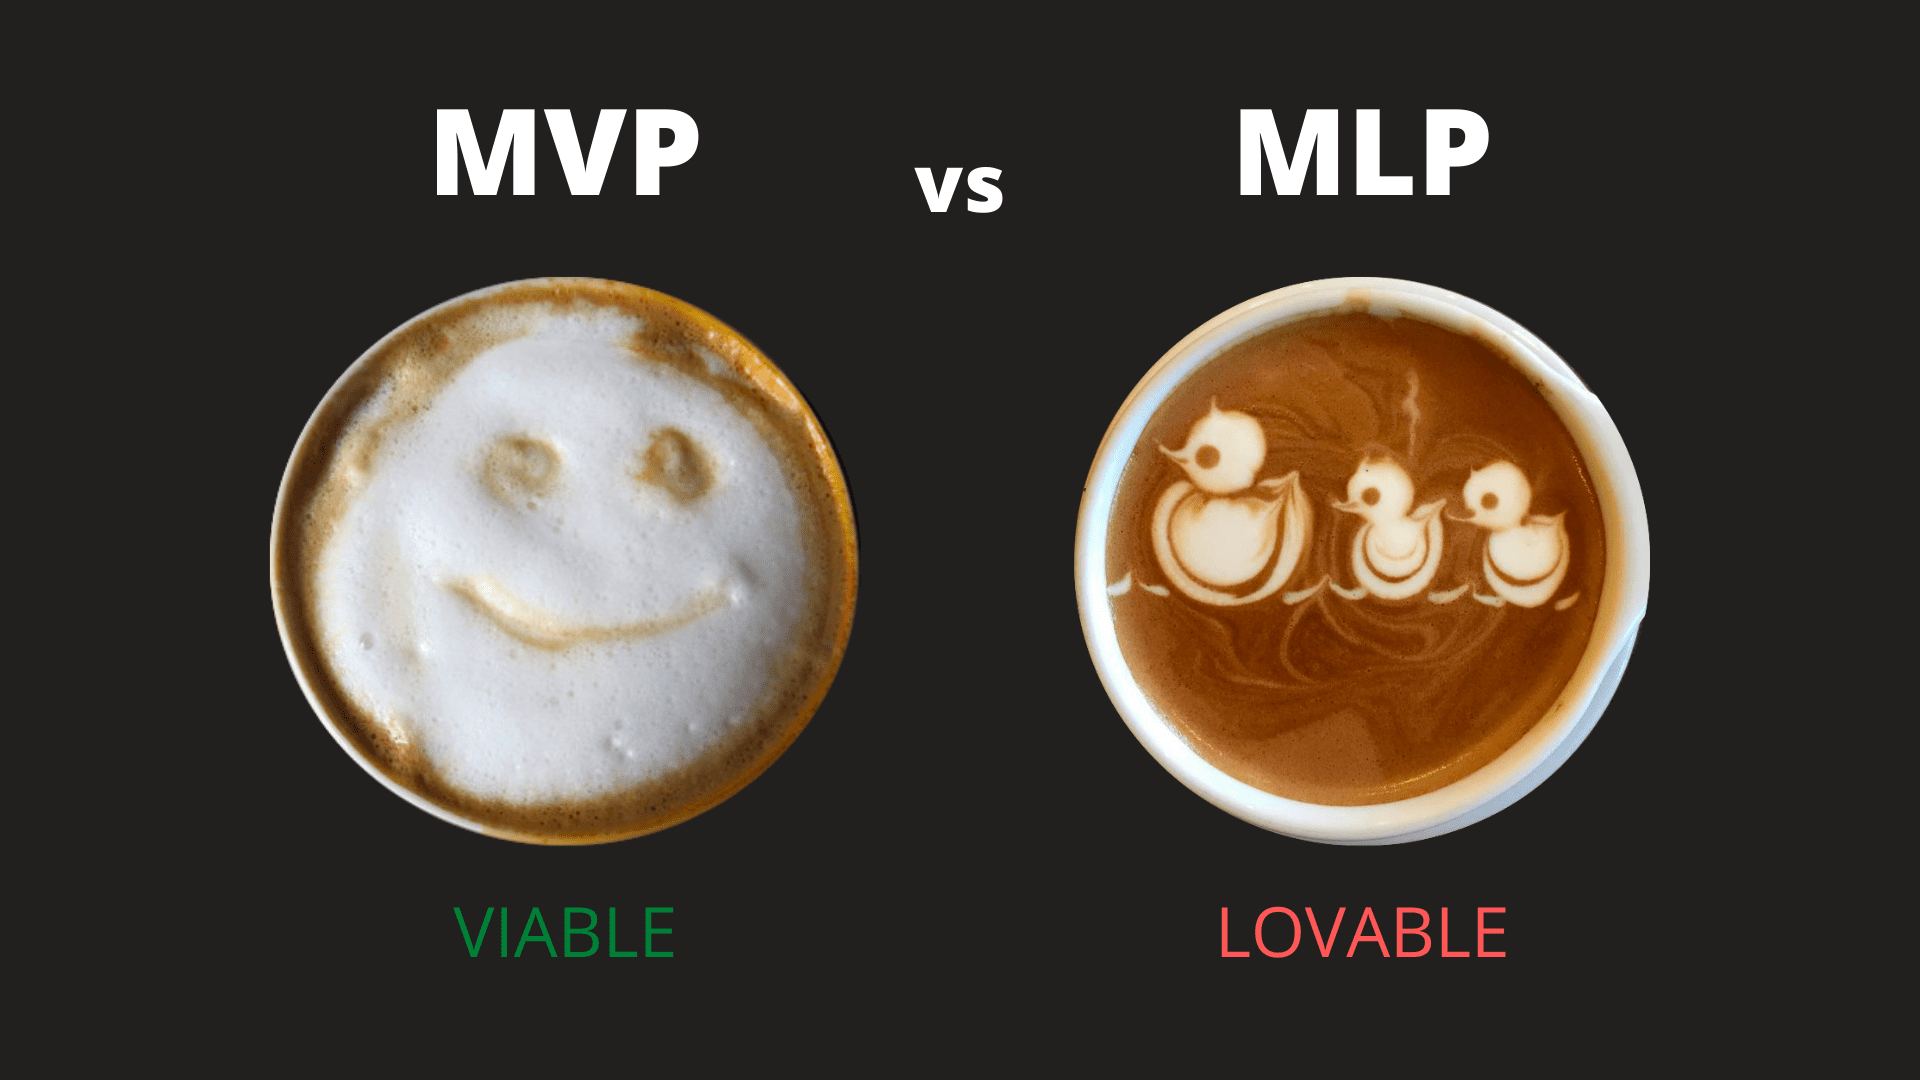 "MVP vs MLP สร้างของที่ ""ใช่"" อาจจะไม่พอ ต้องเป็นของที่ ""รัก"" ด้วย"